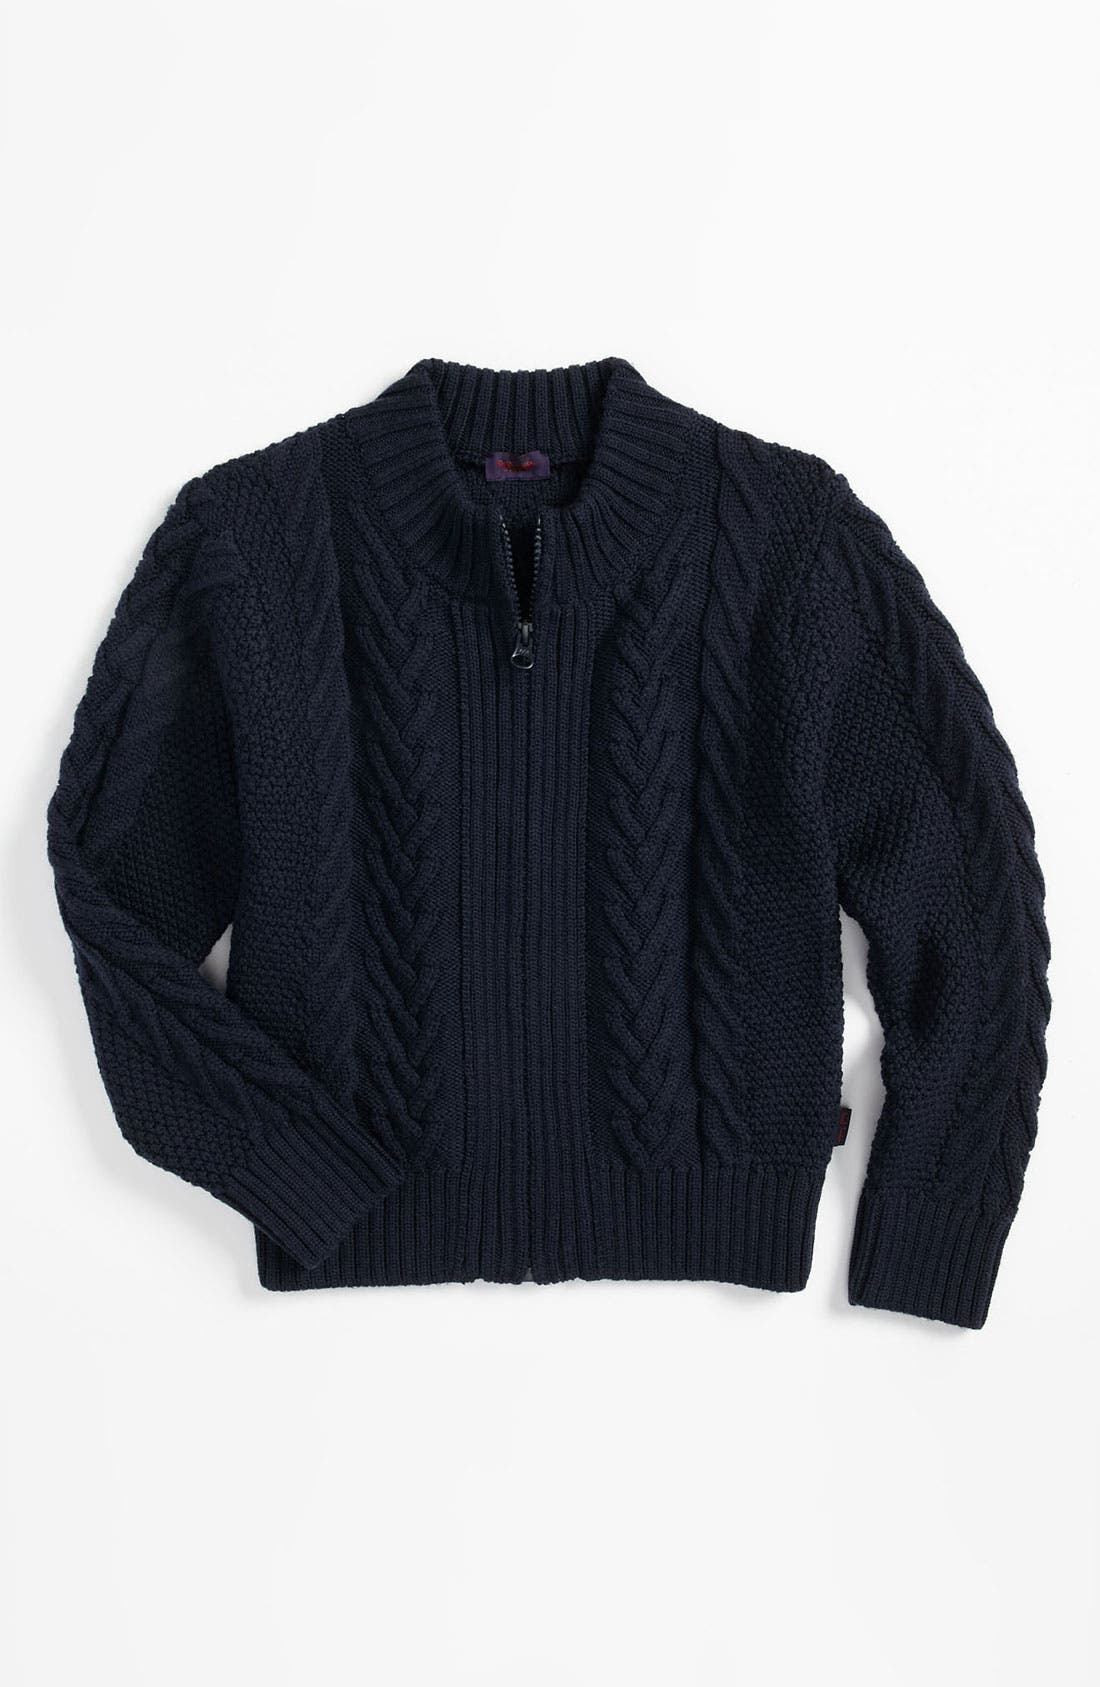 Main Image - Paul Smith Junior Cable Knit Wool Cardigan (Big Boys)